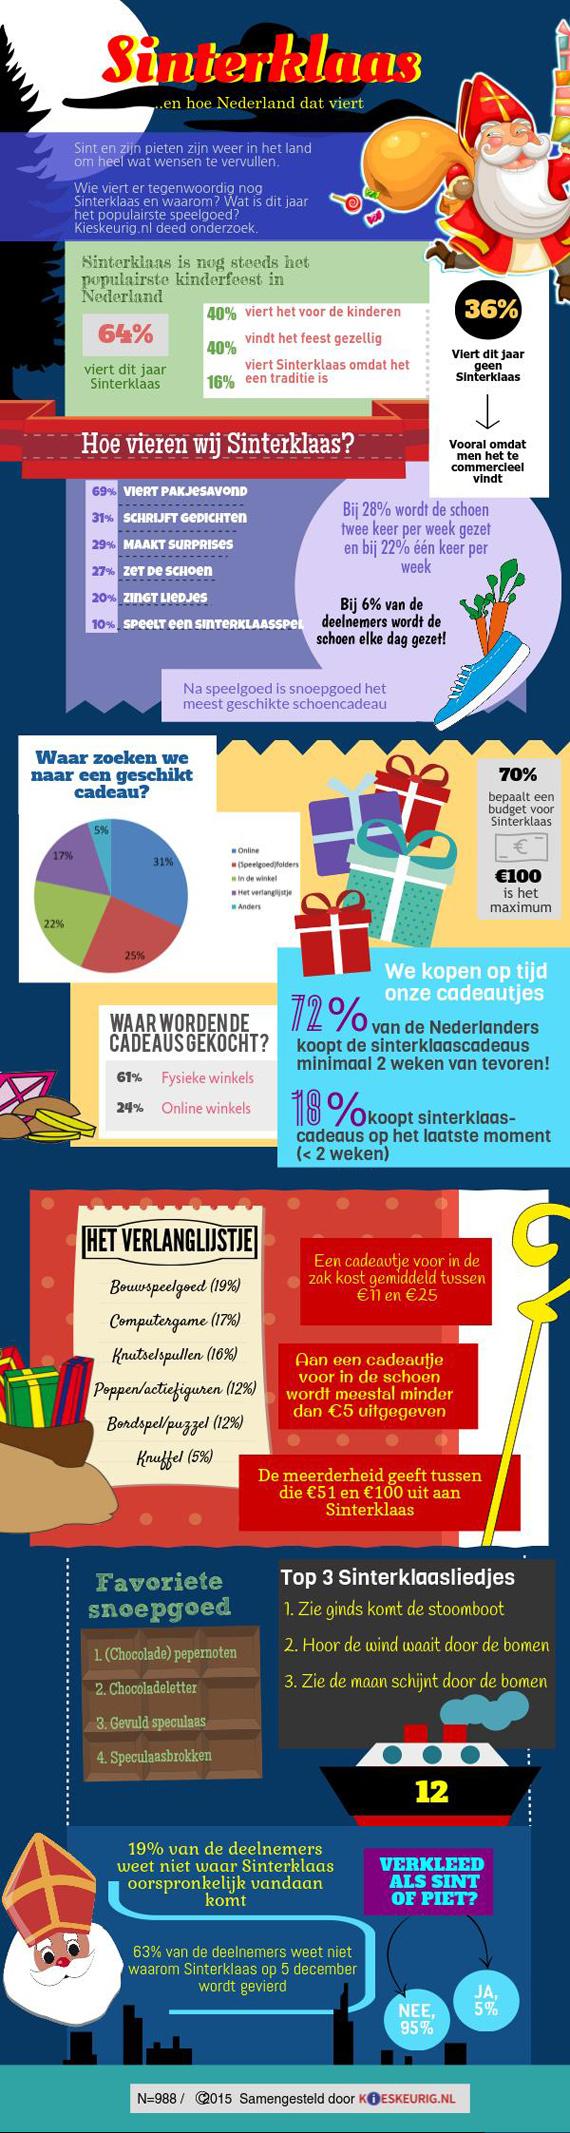 Infographic Sinterklaas 2015